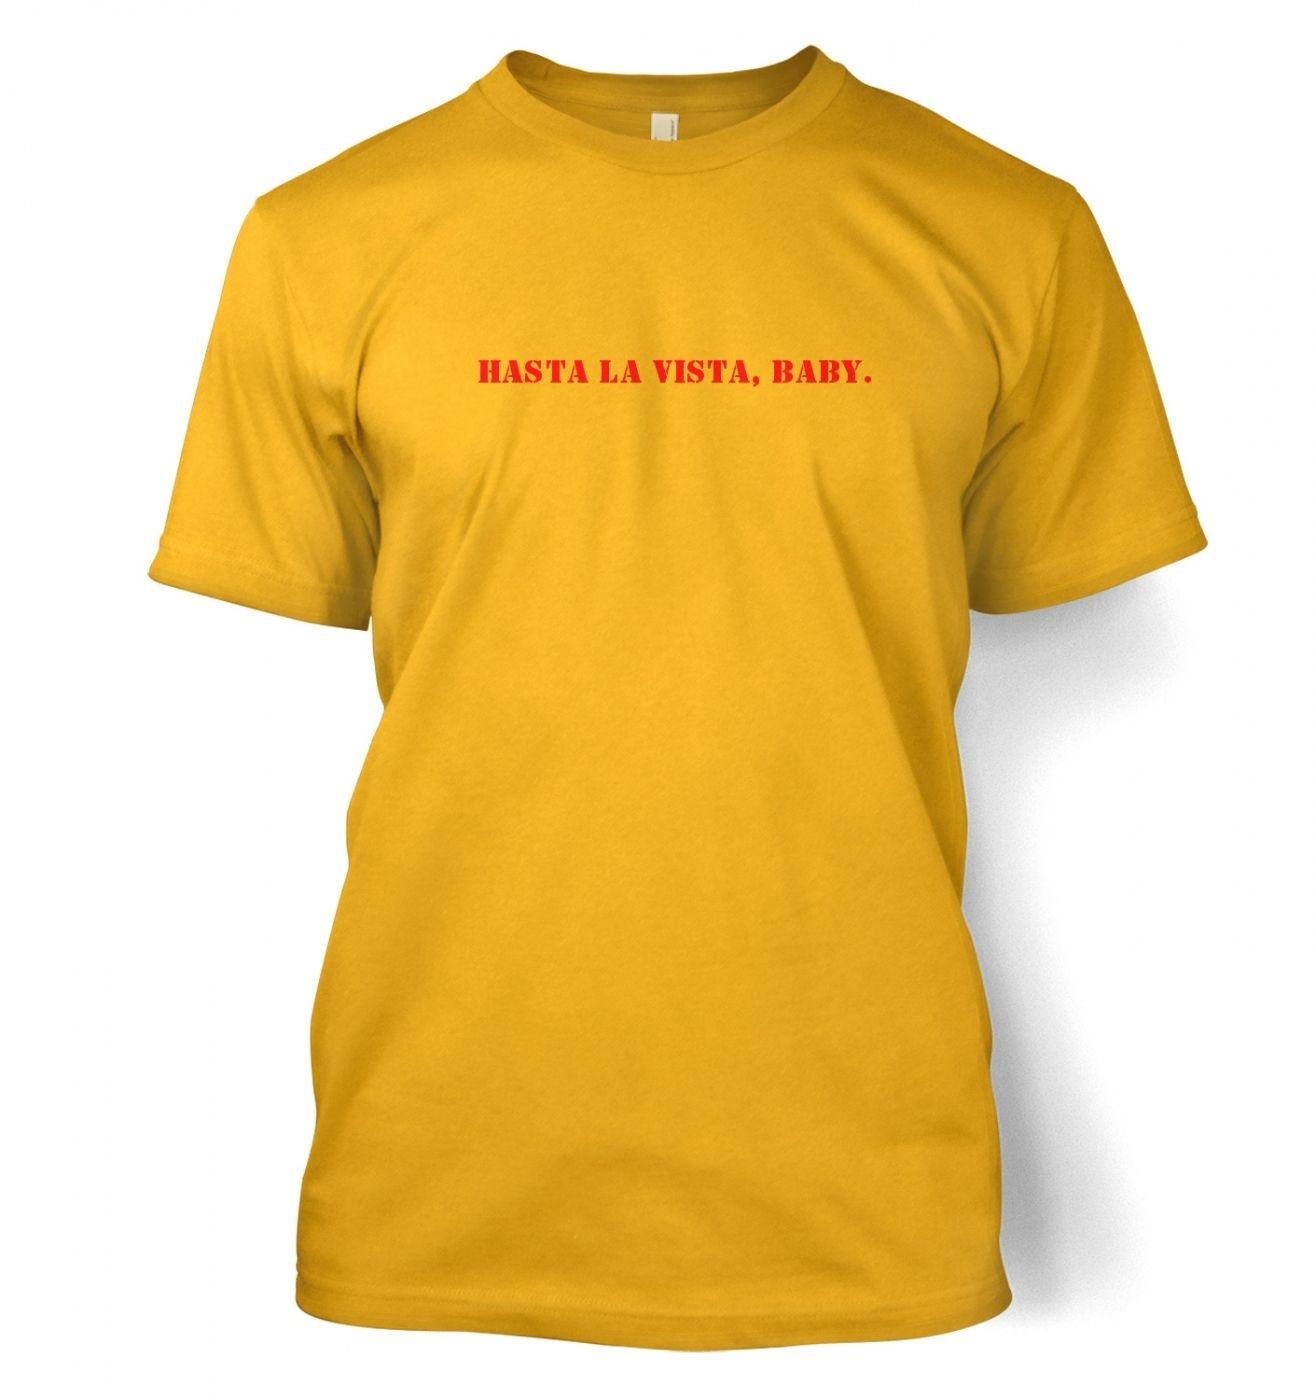 Hasta La Vista, Baby men's t-shirt